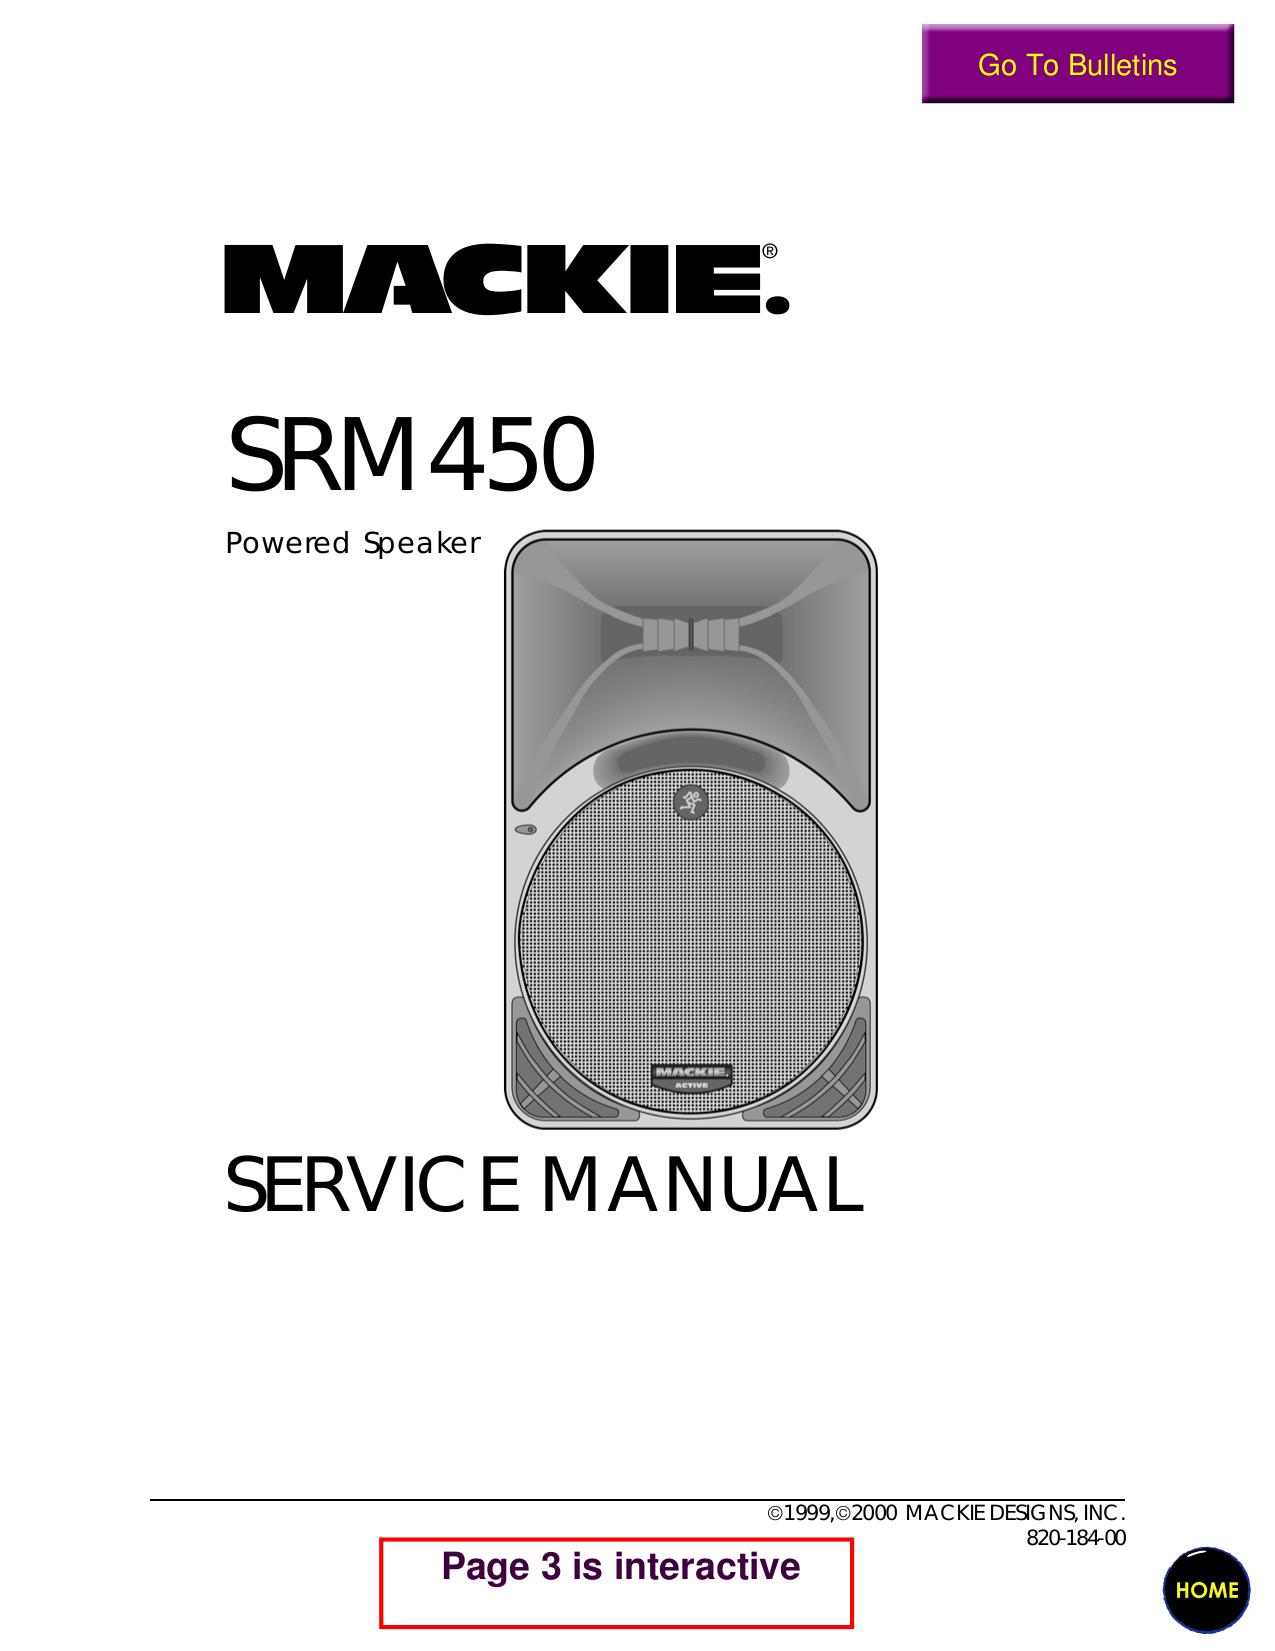 Mackie smr 450 инструкция